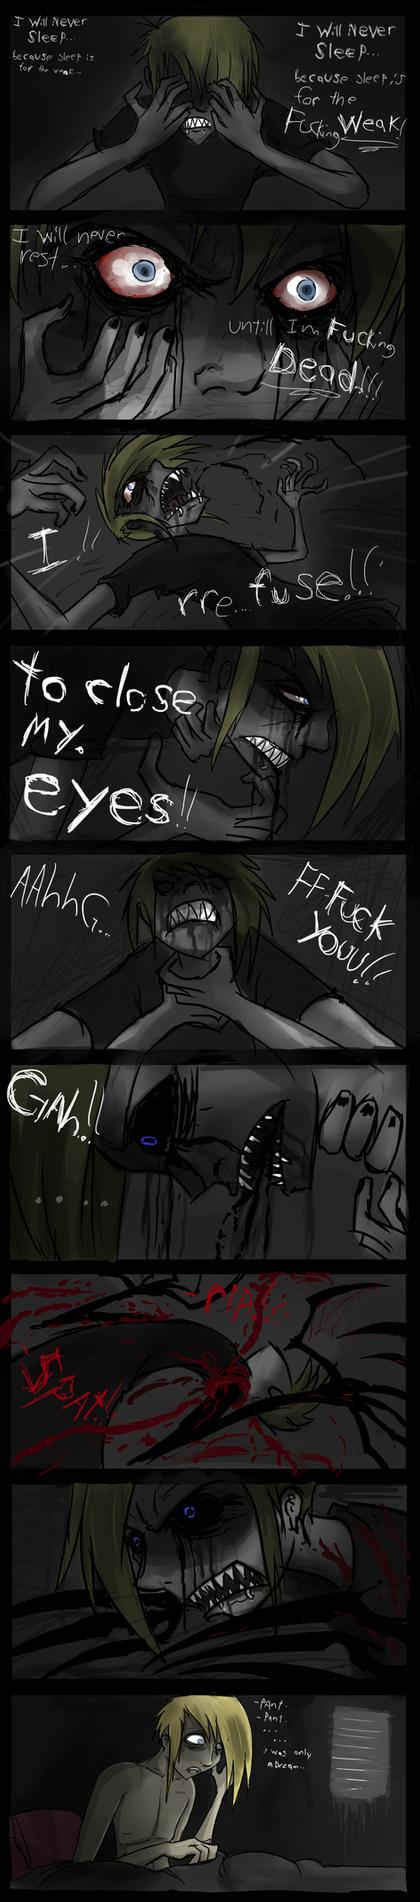 i wont sleep... by Corpse-boy